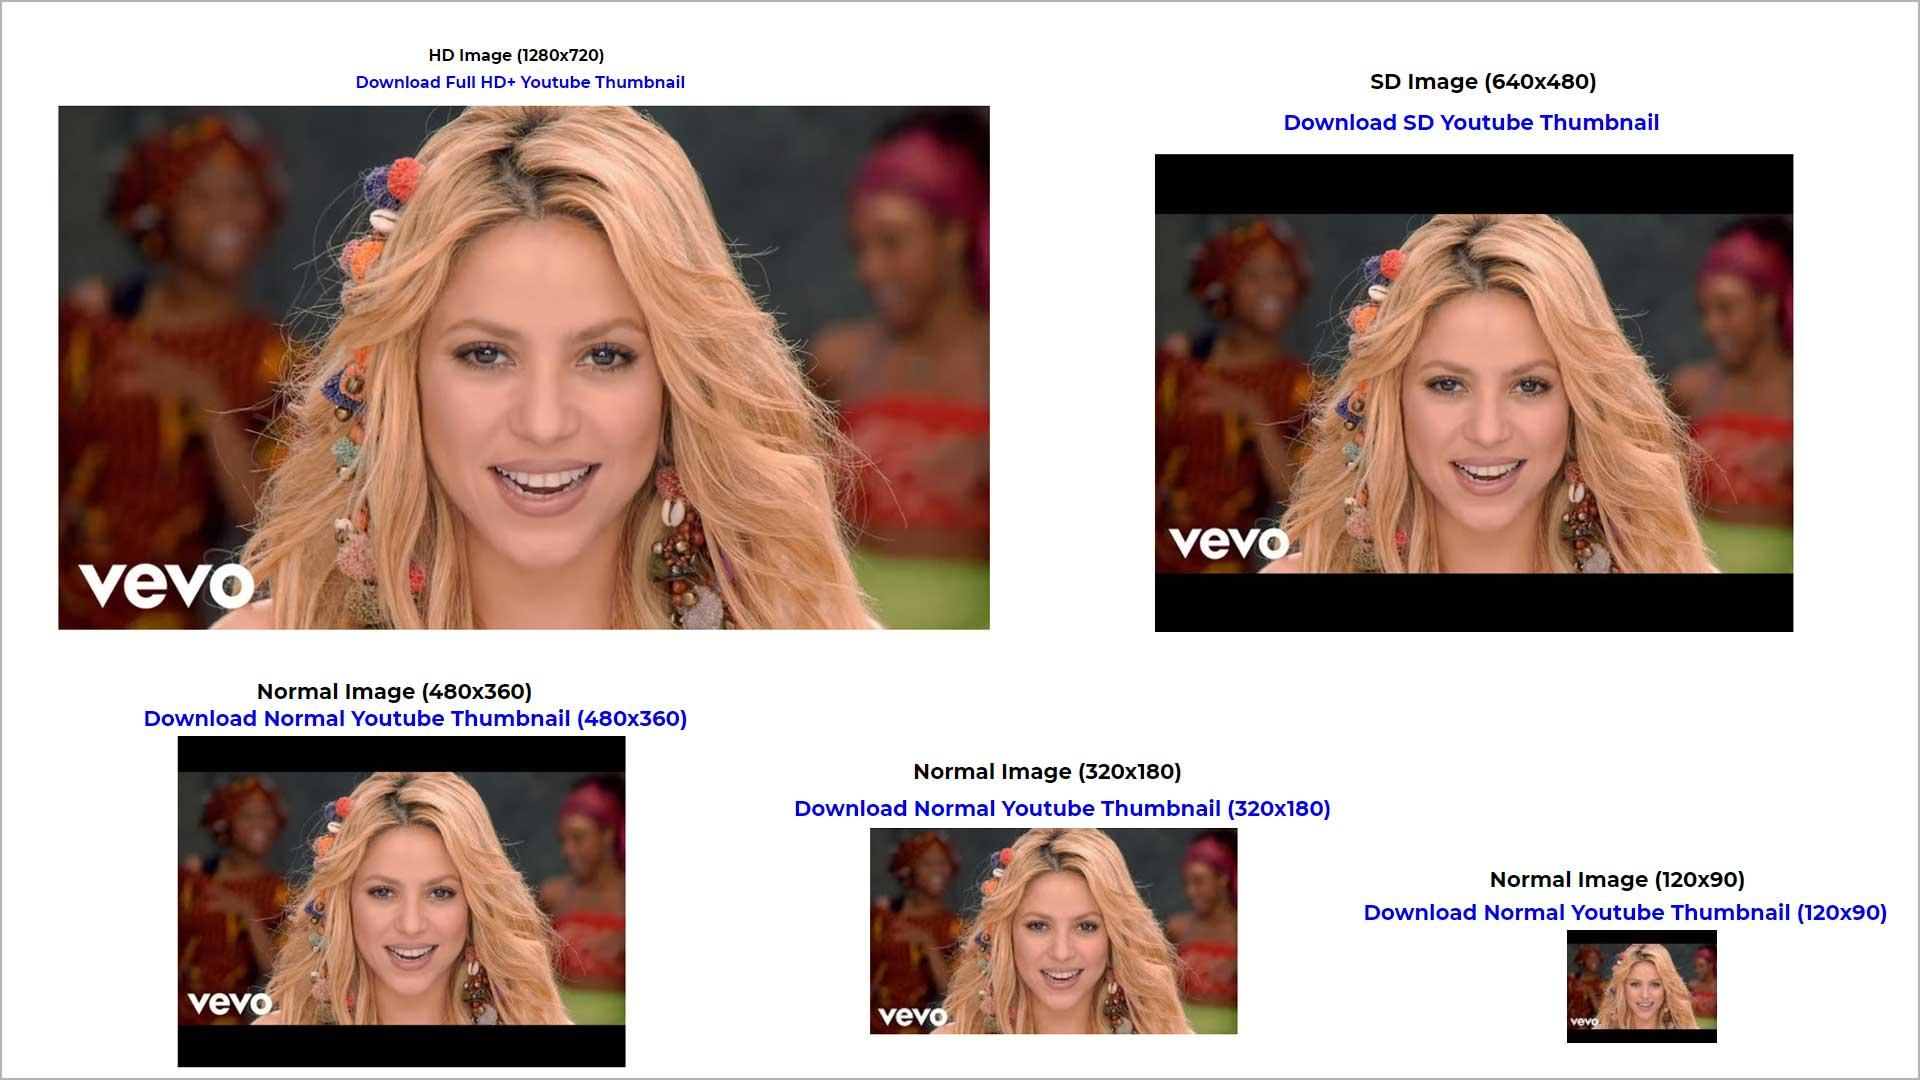 Download YouTube Thumbnail